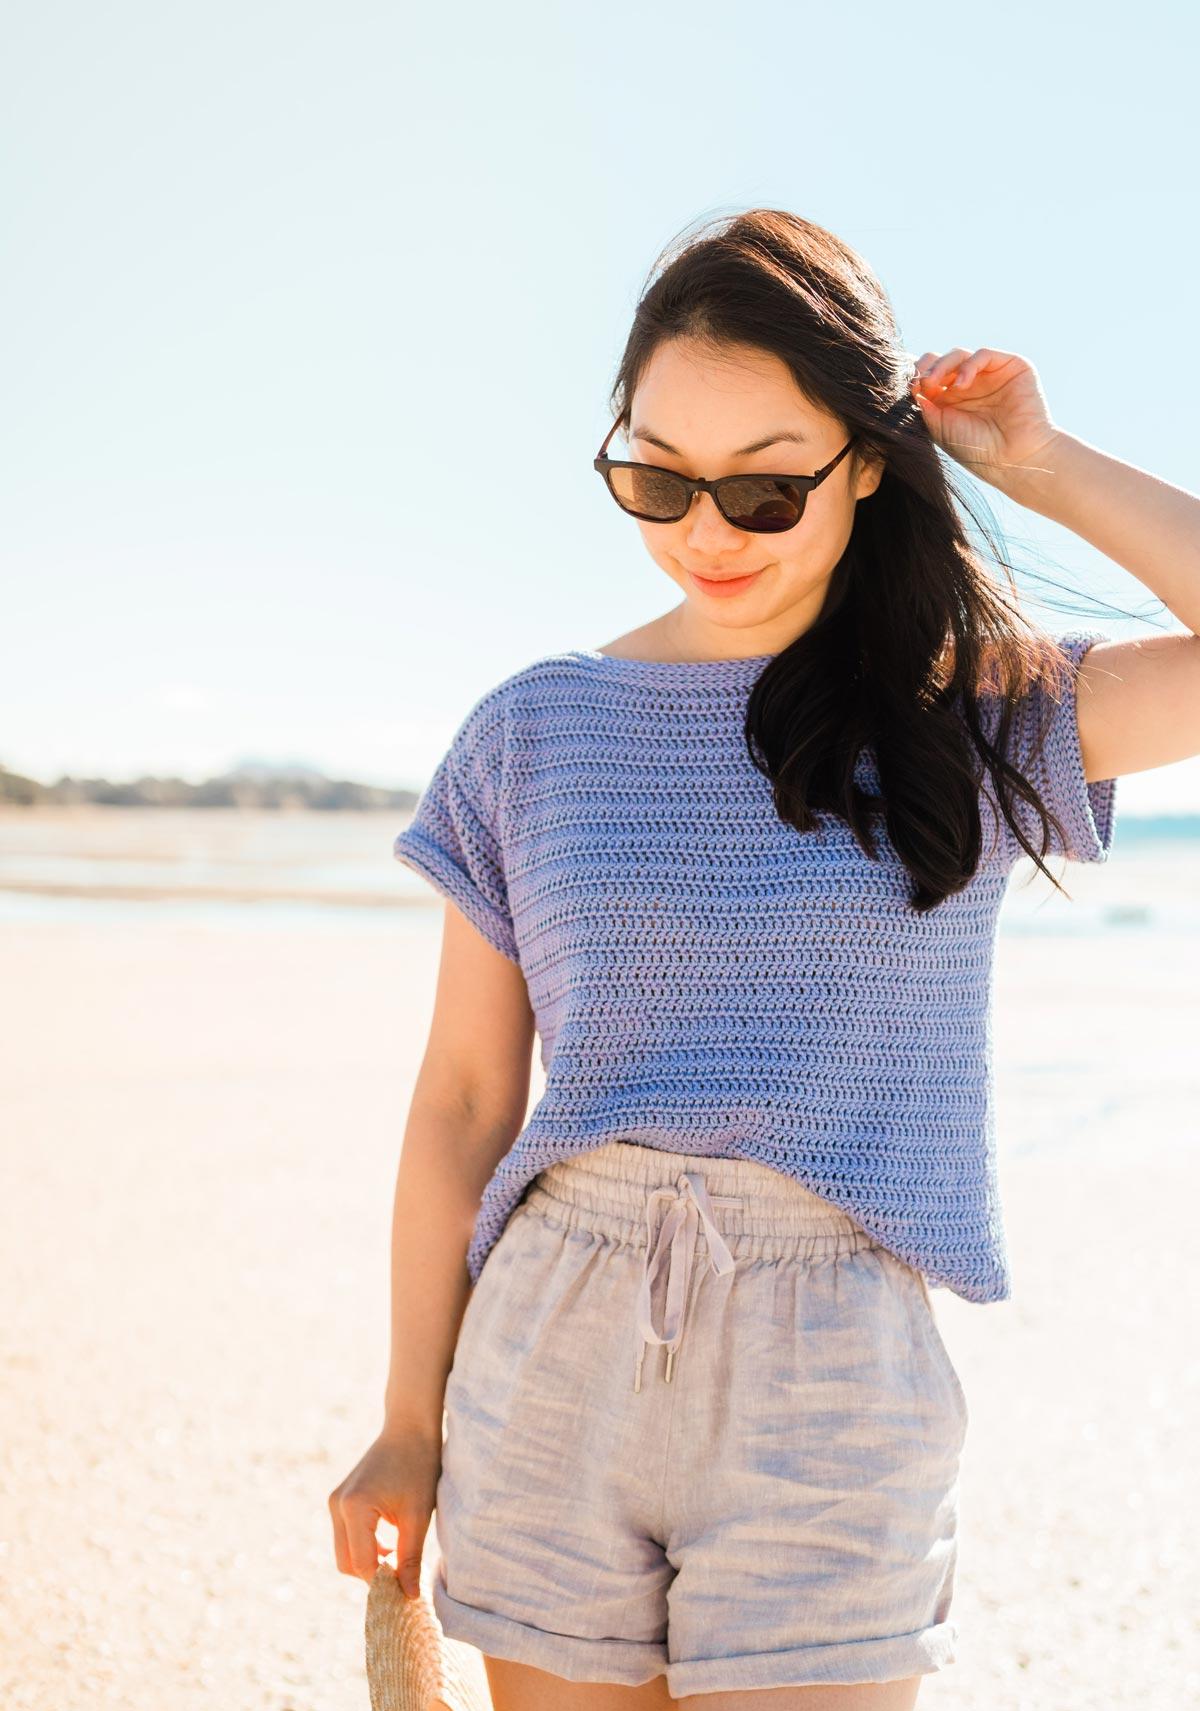 model wearing purple cotton crochet shirt with beige linen shorts